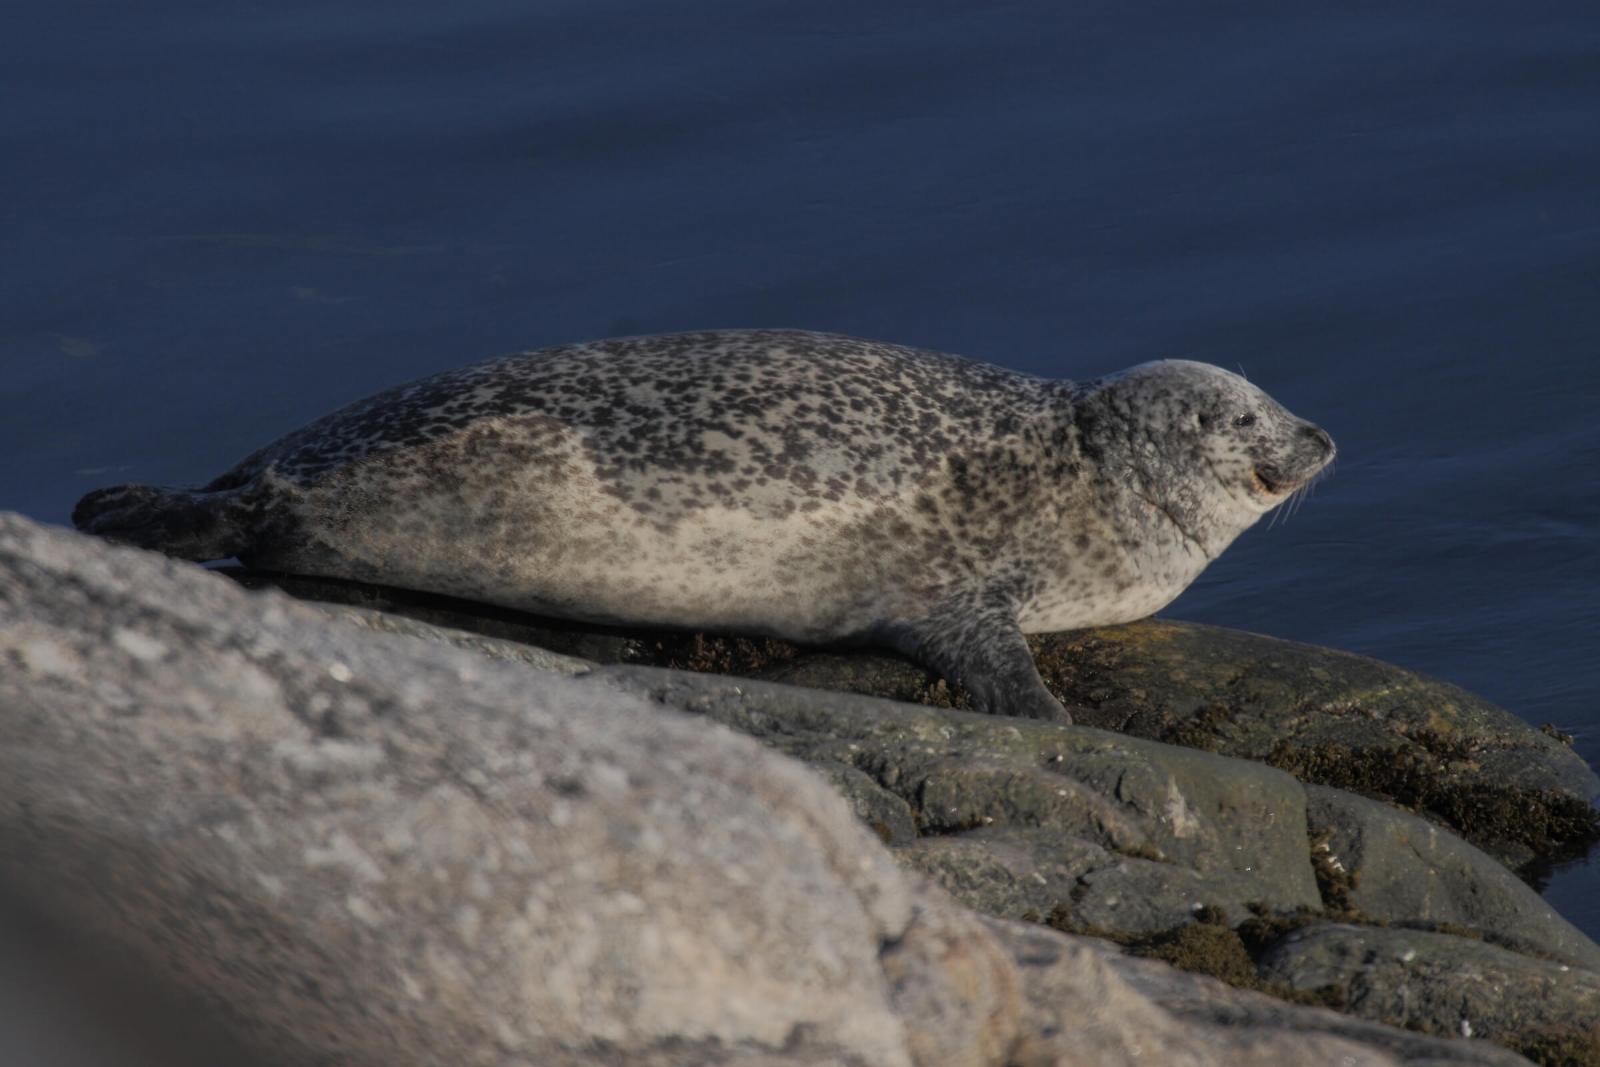 A harbor seal in Greenland, by Aqqa Rosing-Asvid